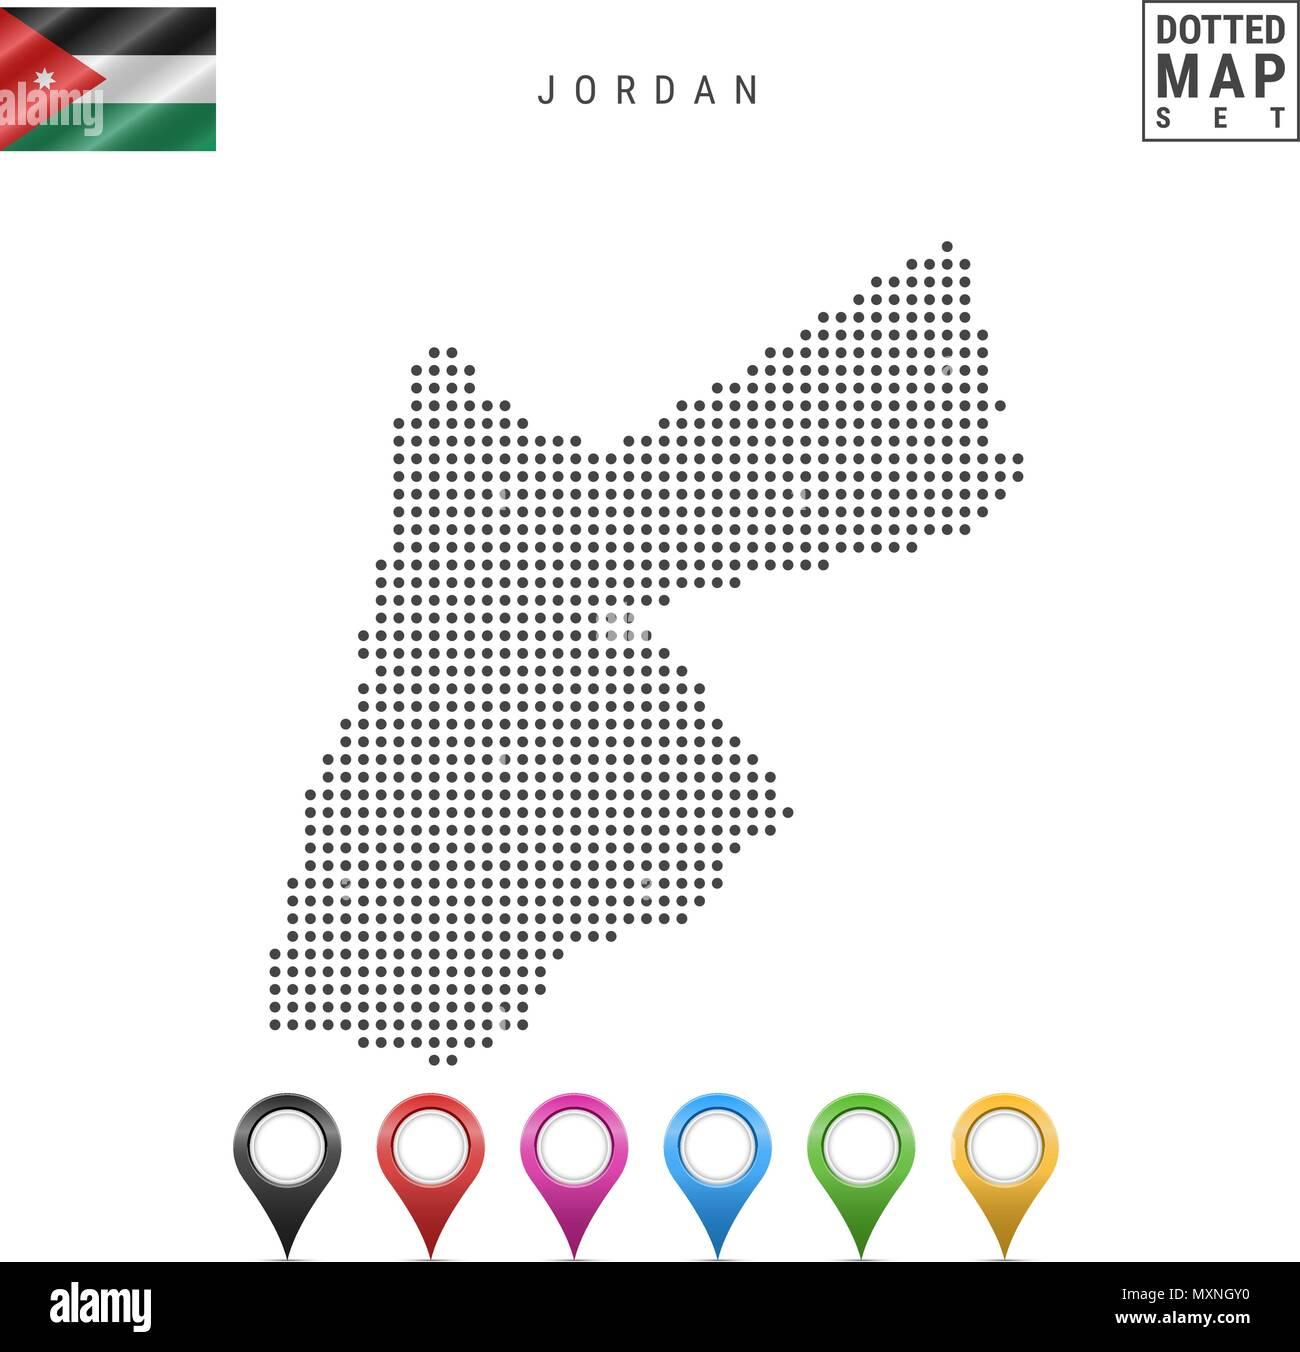 Vector Dotted Map of Jordan. Simple Silhouette of Jordan. The National Flag of Jordan. Set of Multicolored Map Markers - Stock Image